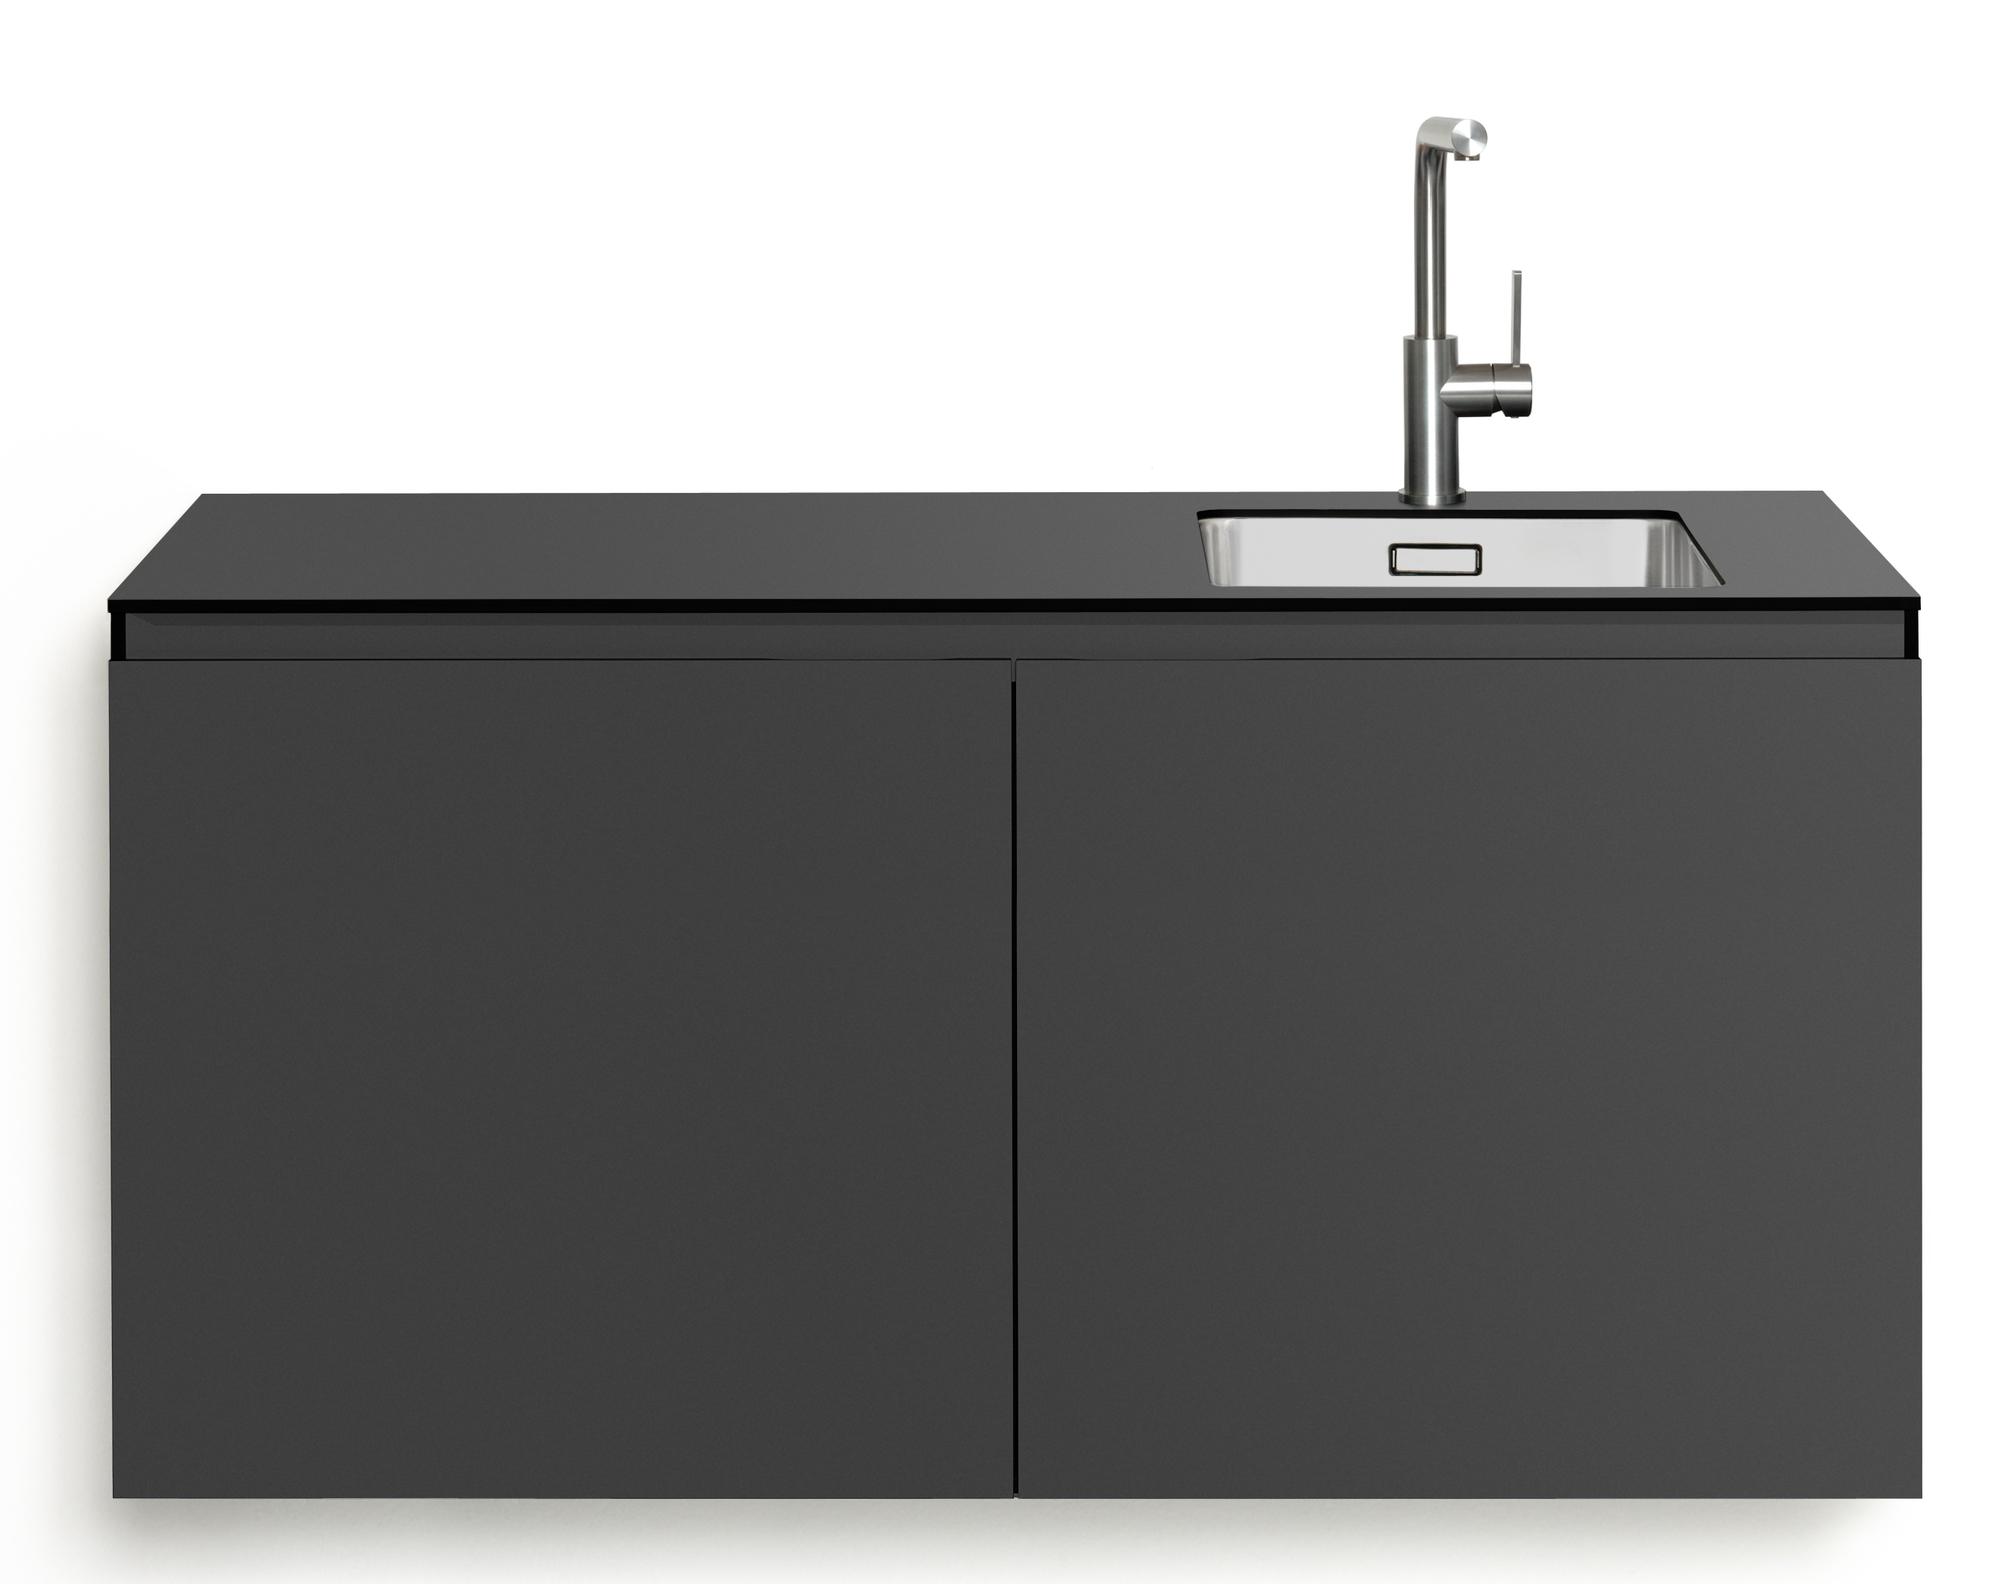 SL Light Kitchen Module without Cooking zone Anthracite Miniki